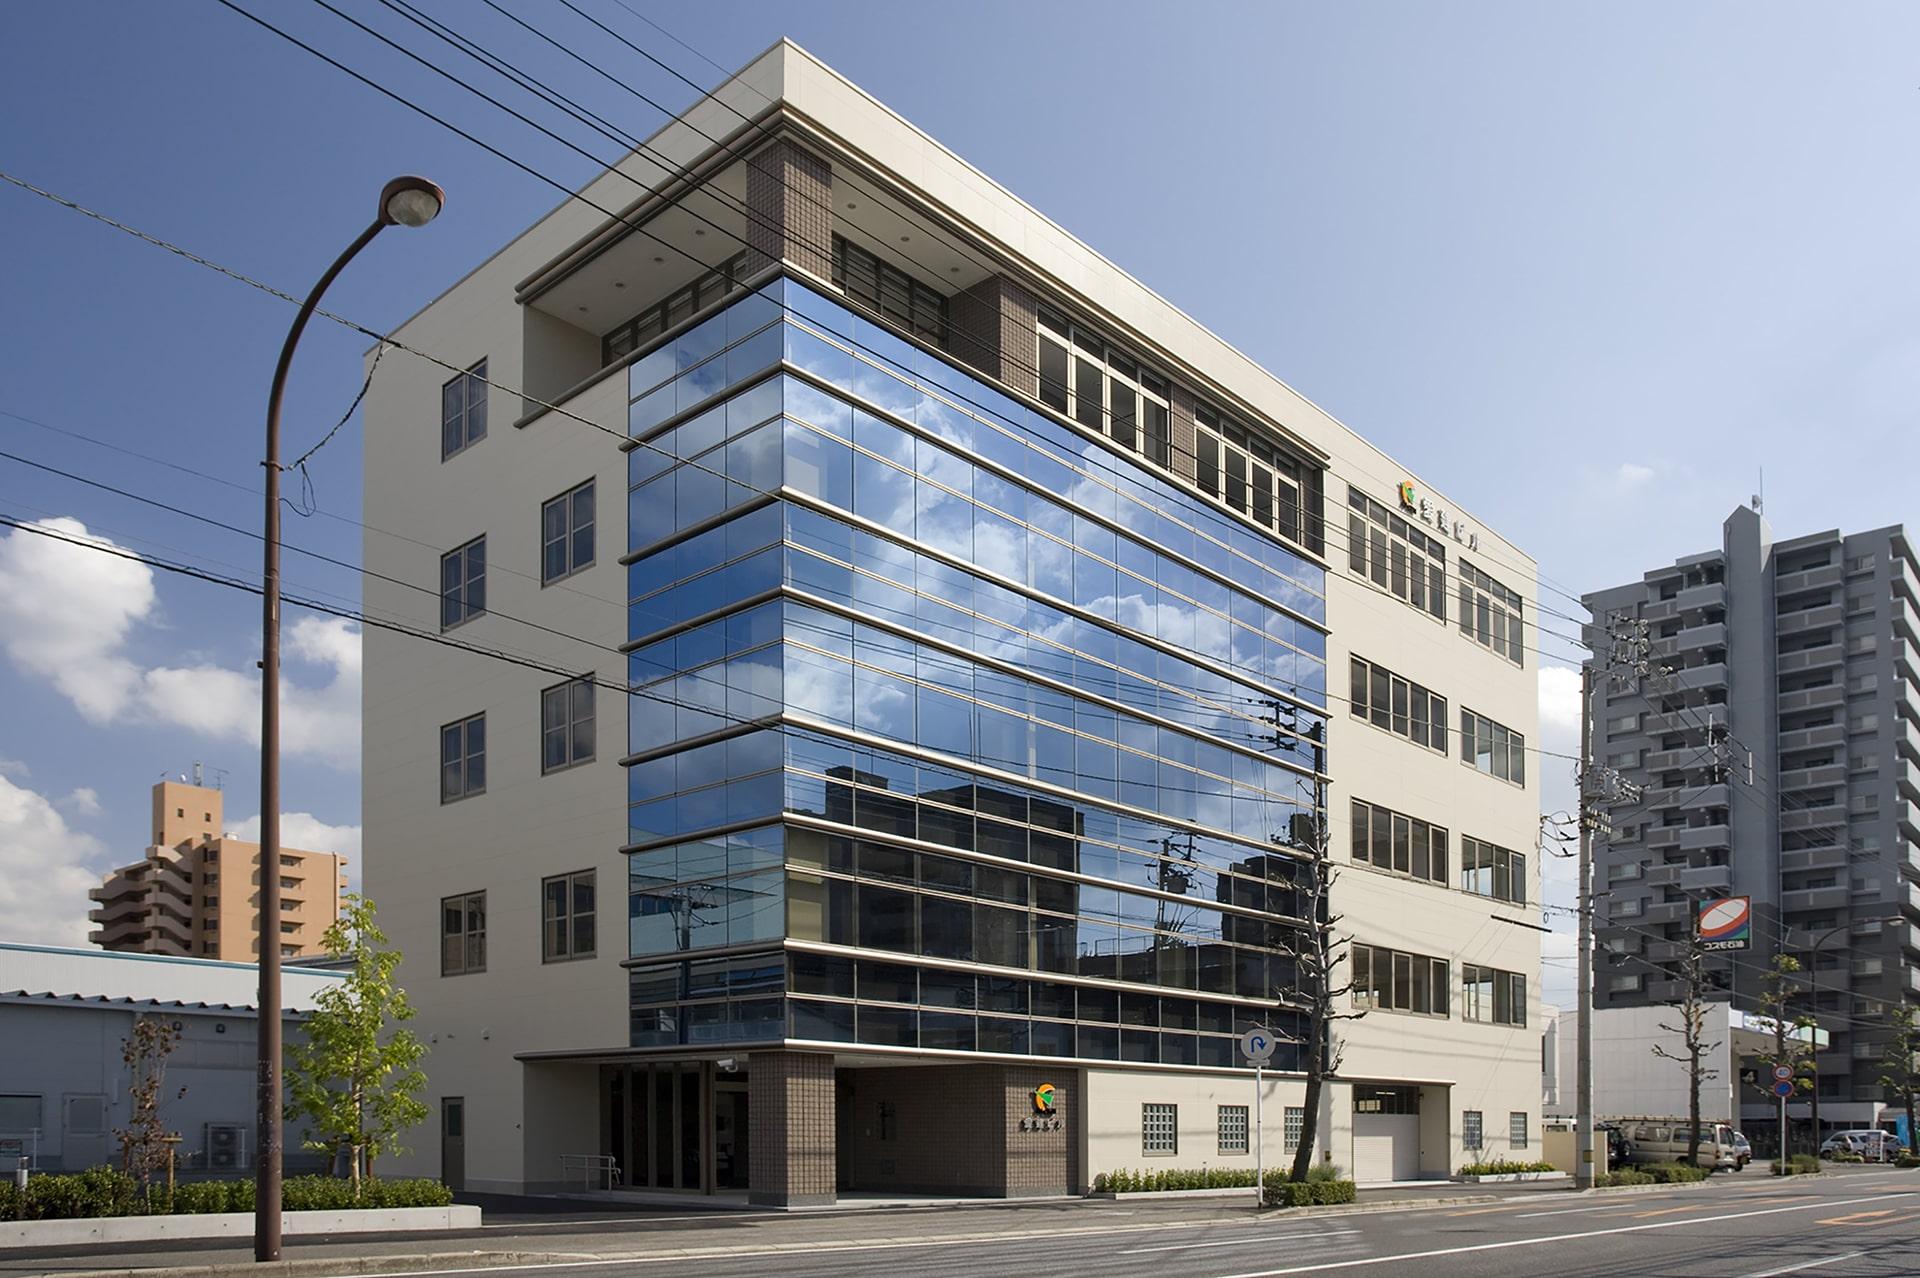 愛媛県建設労働組合ビルの写真